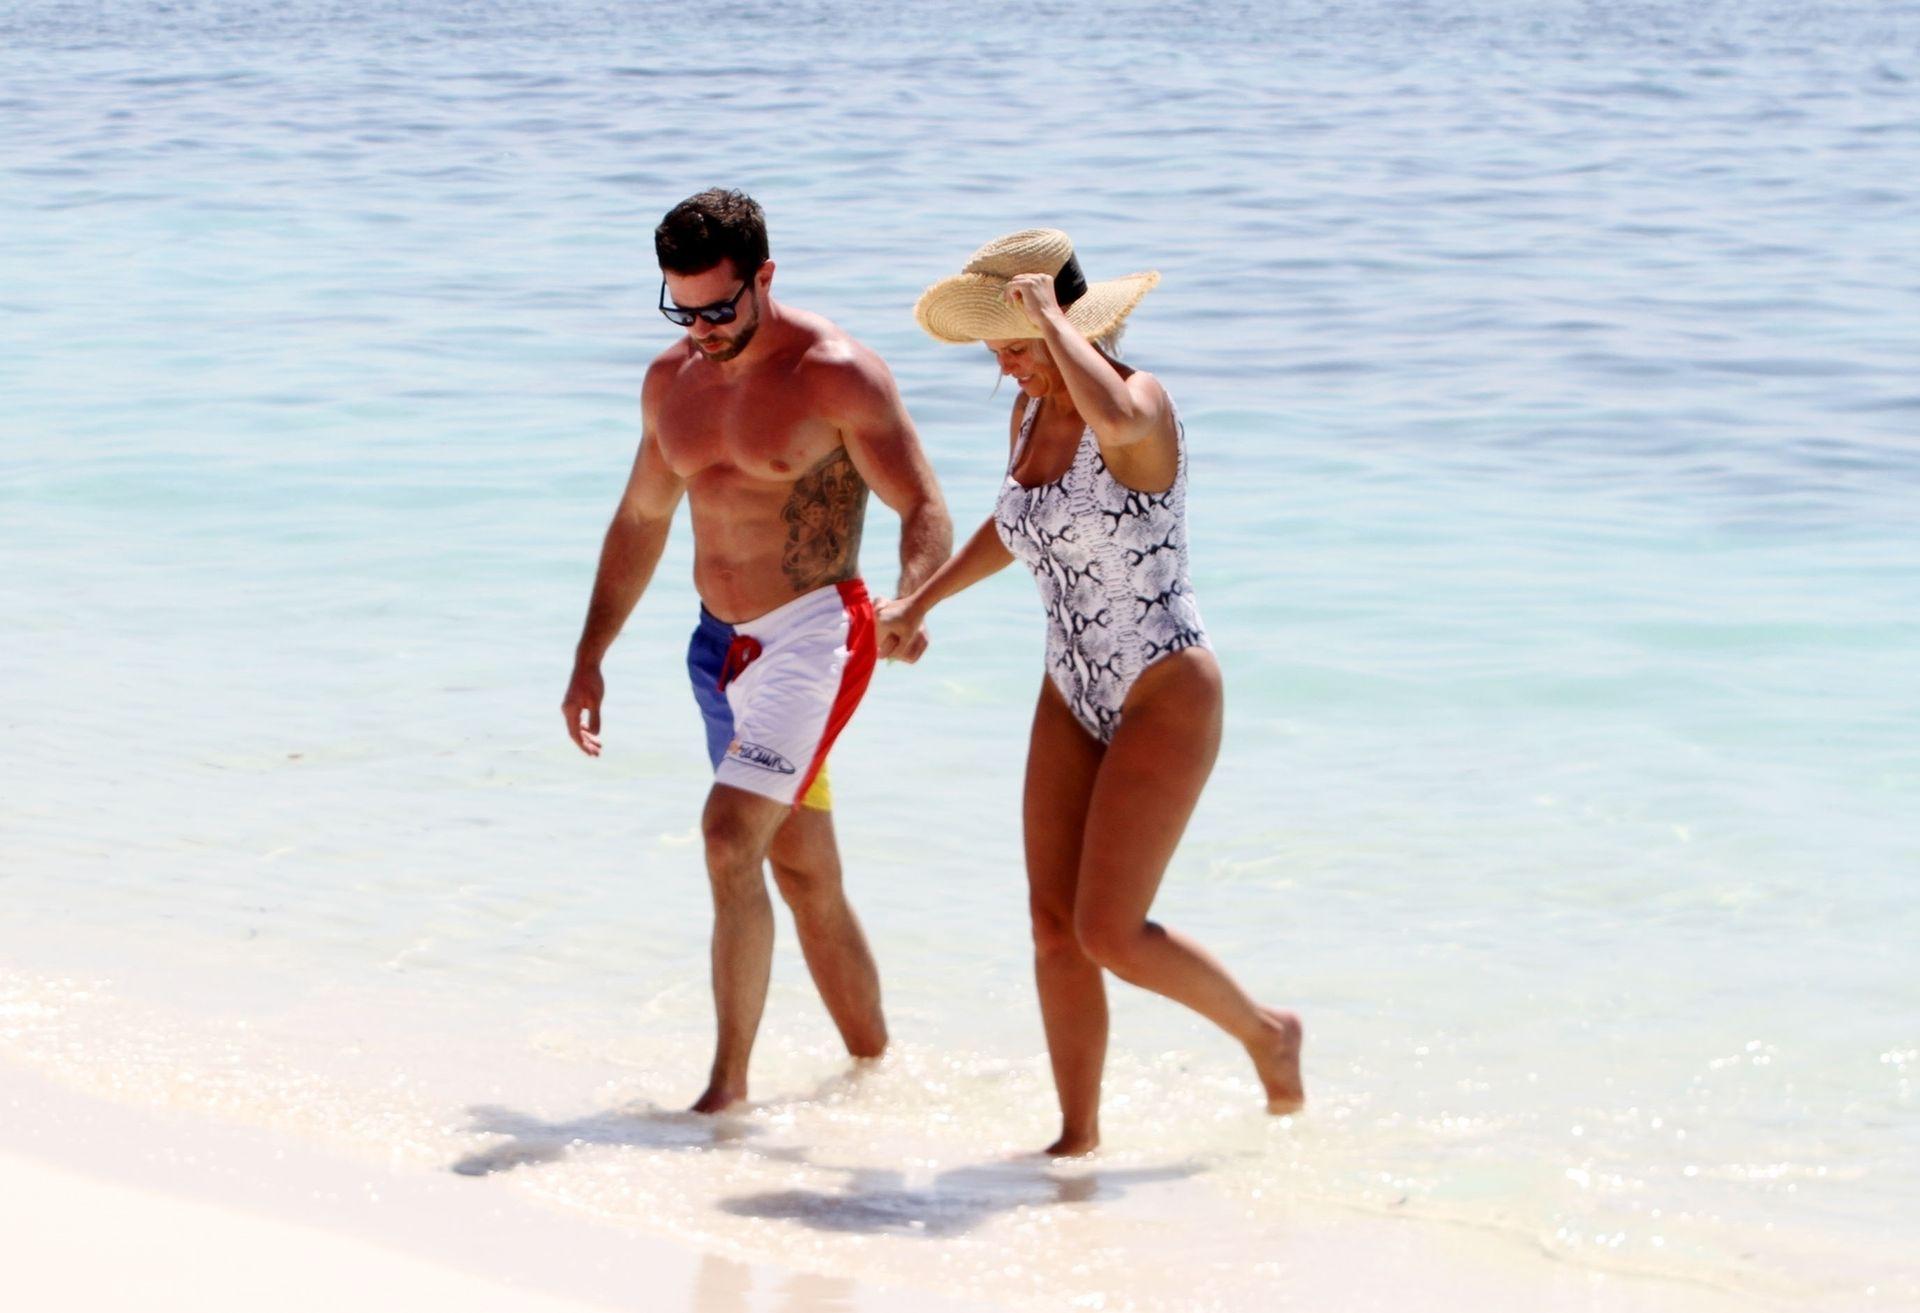 Kerry Katona & Ryan Mahoney Hit The Beach On Holiday At Their Luxury 5 Star Resort Ayada Maldives 0012